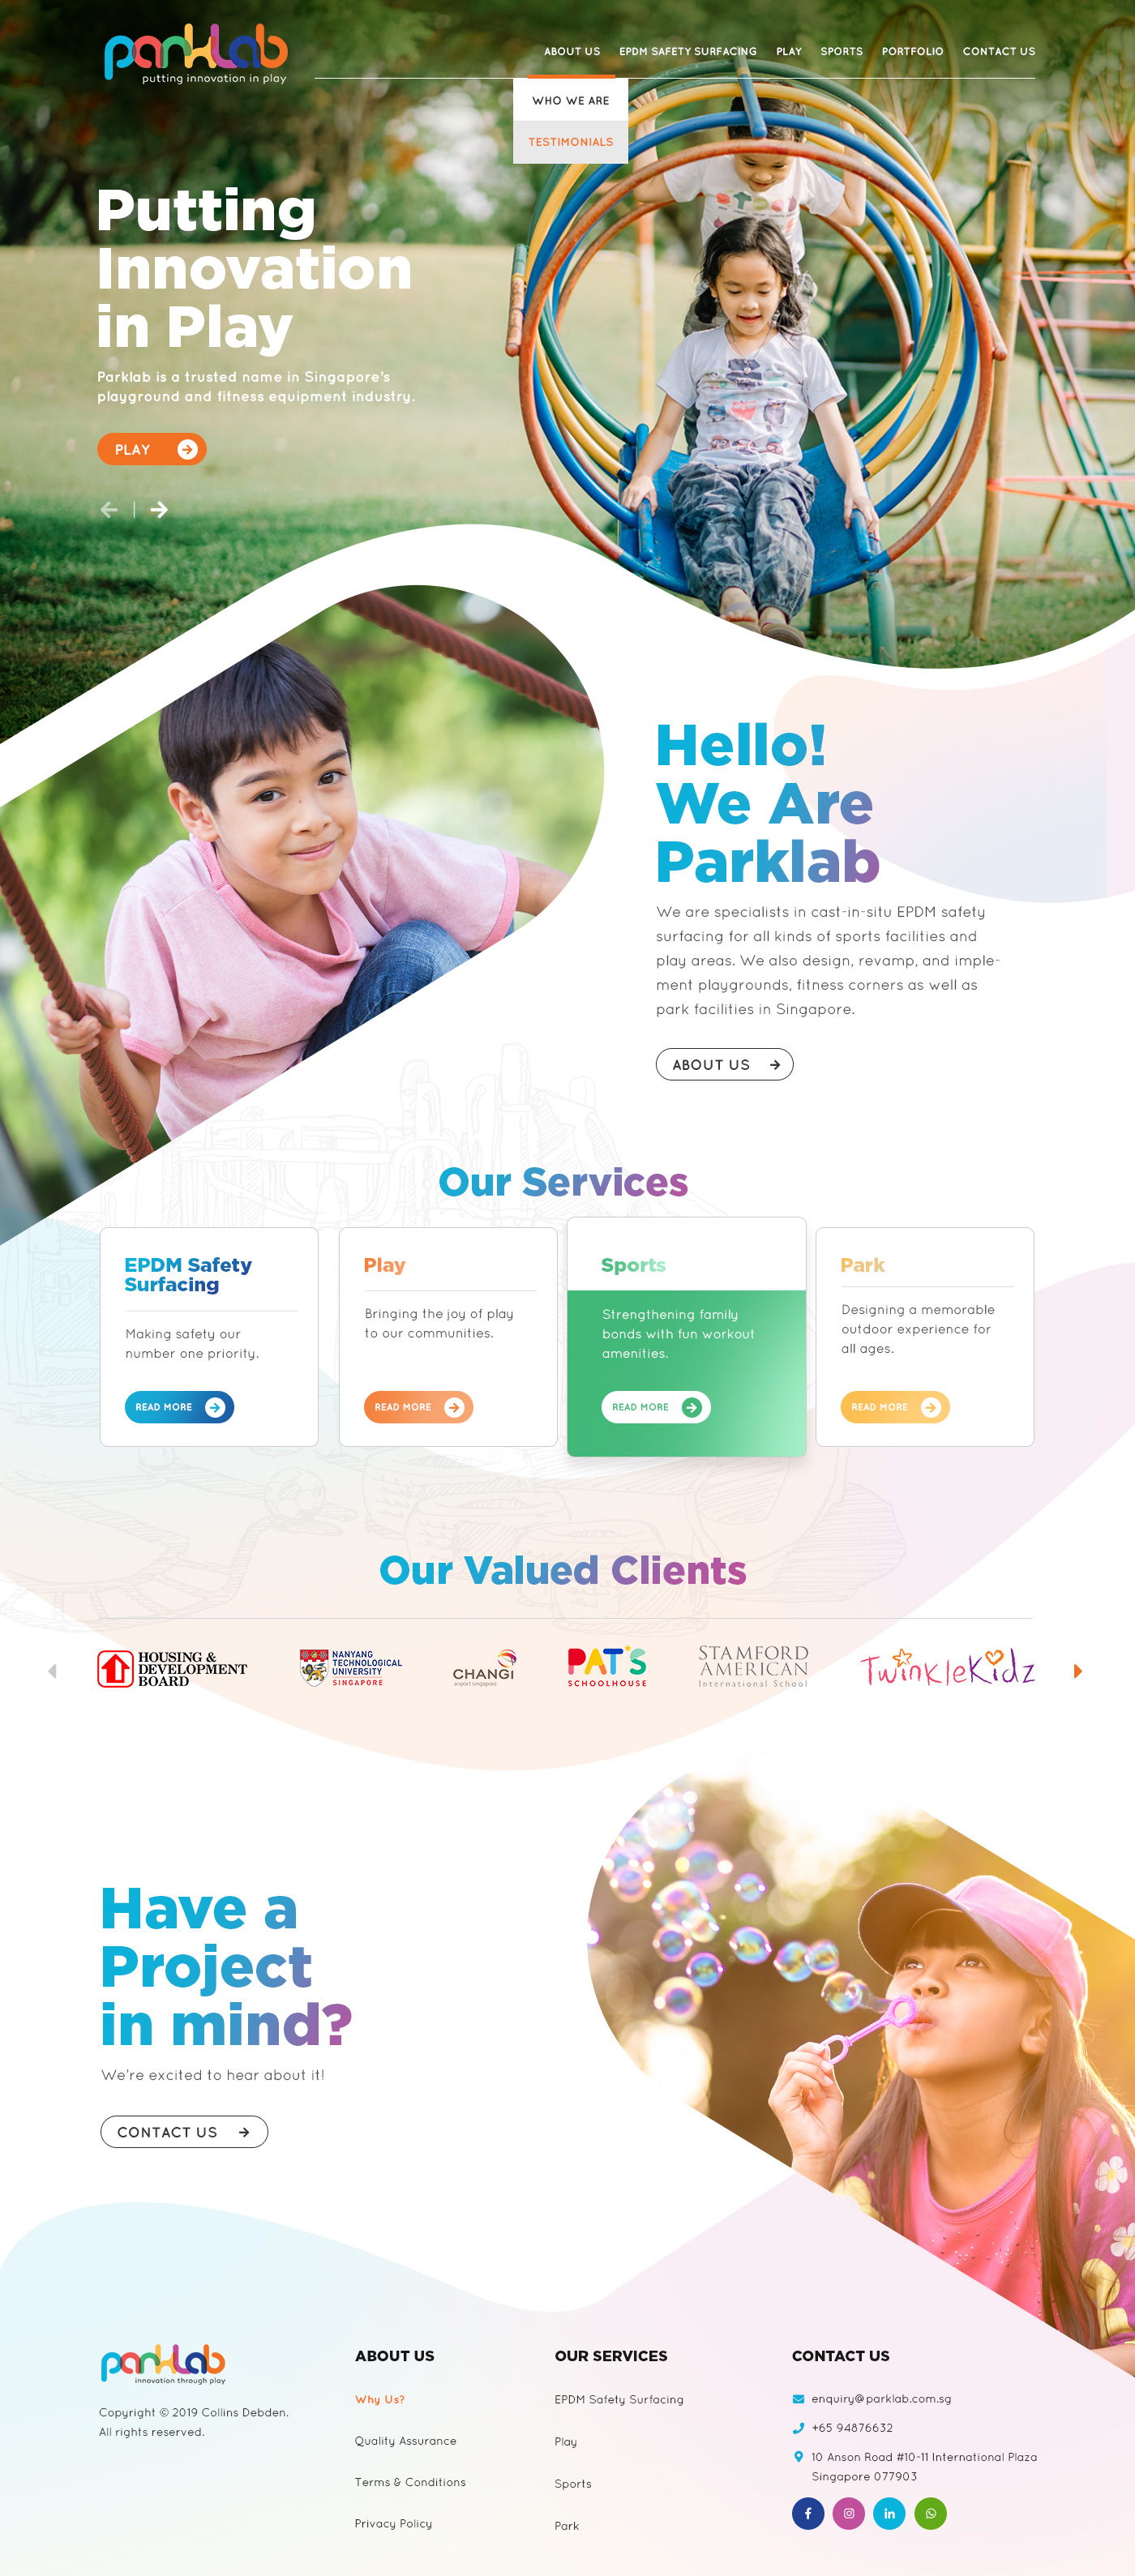 Web Design Philippines | Website Design & Web Development Company